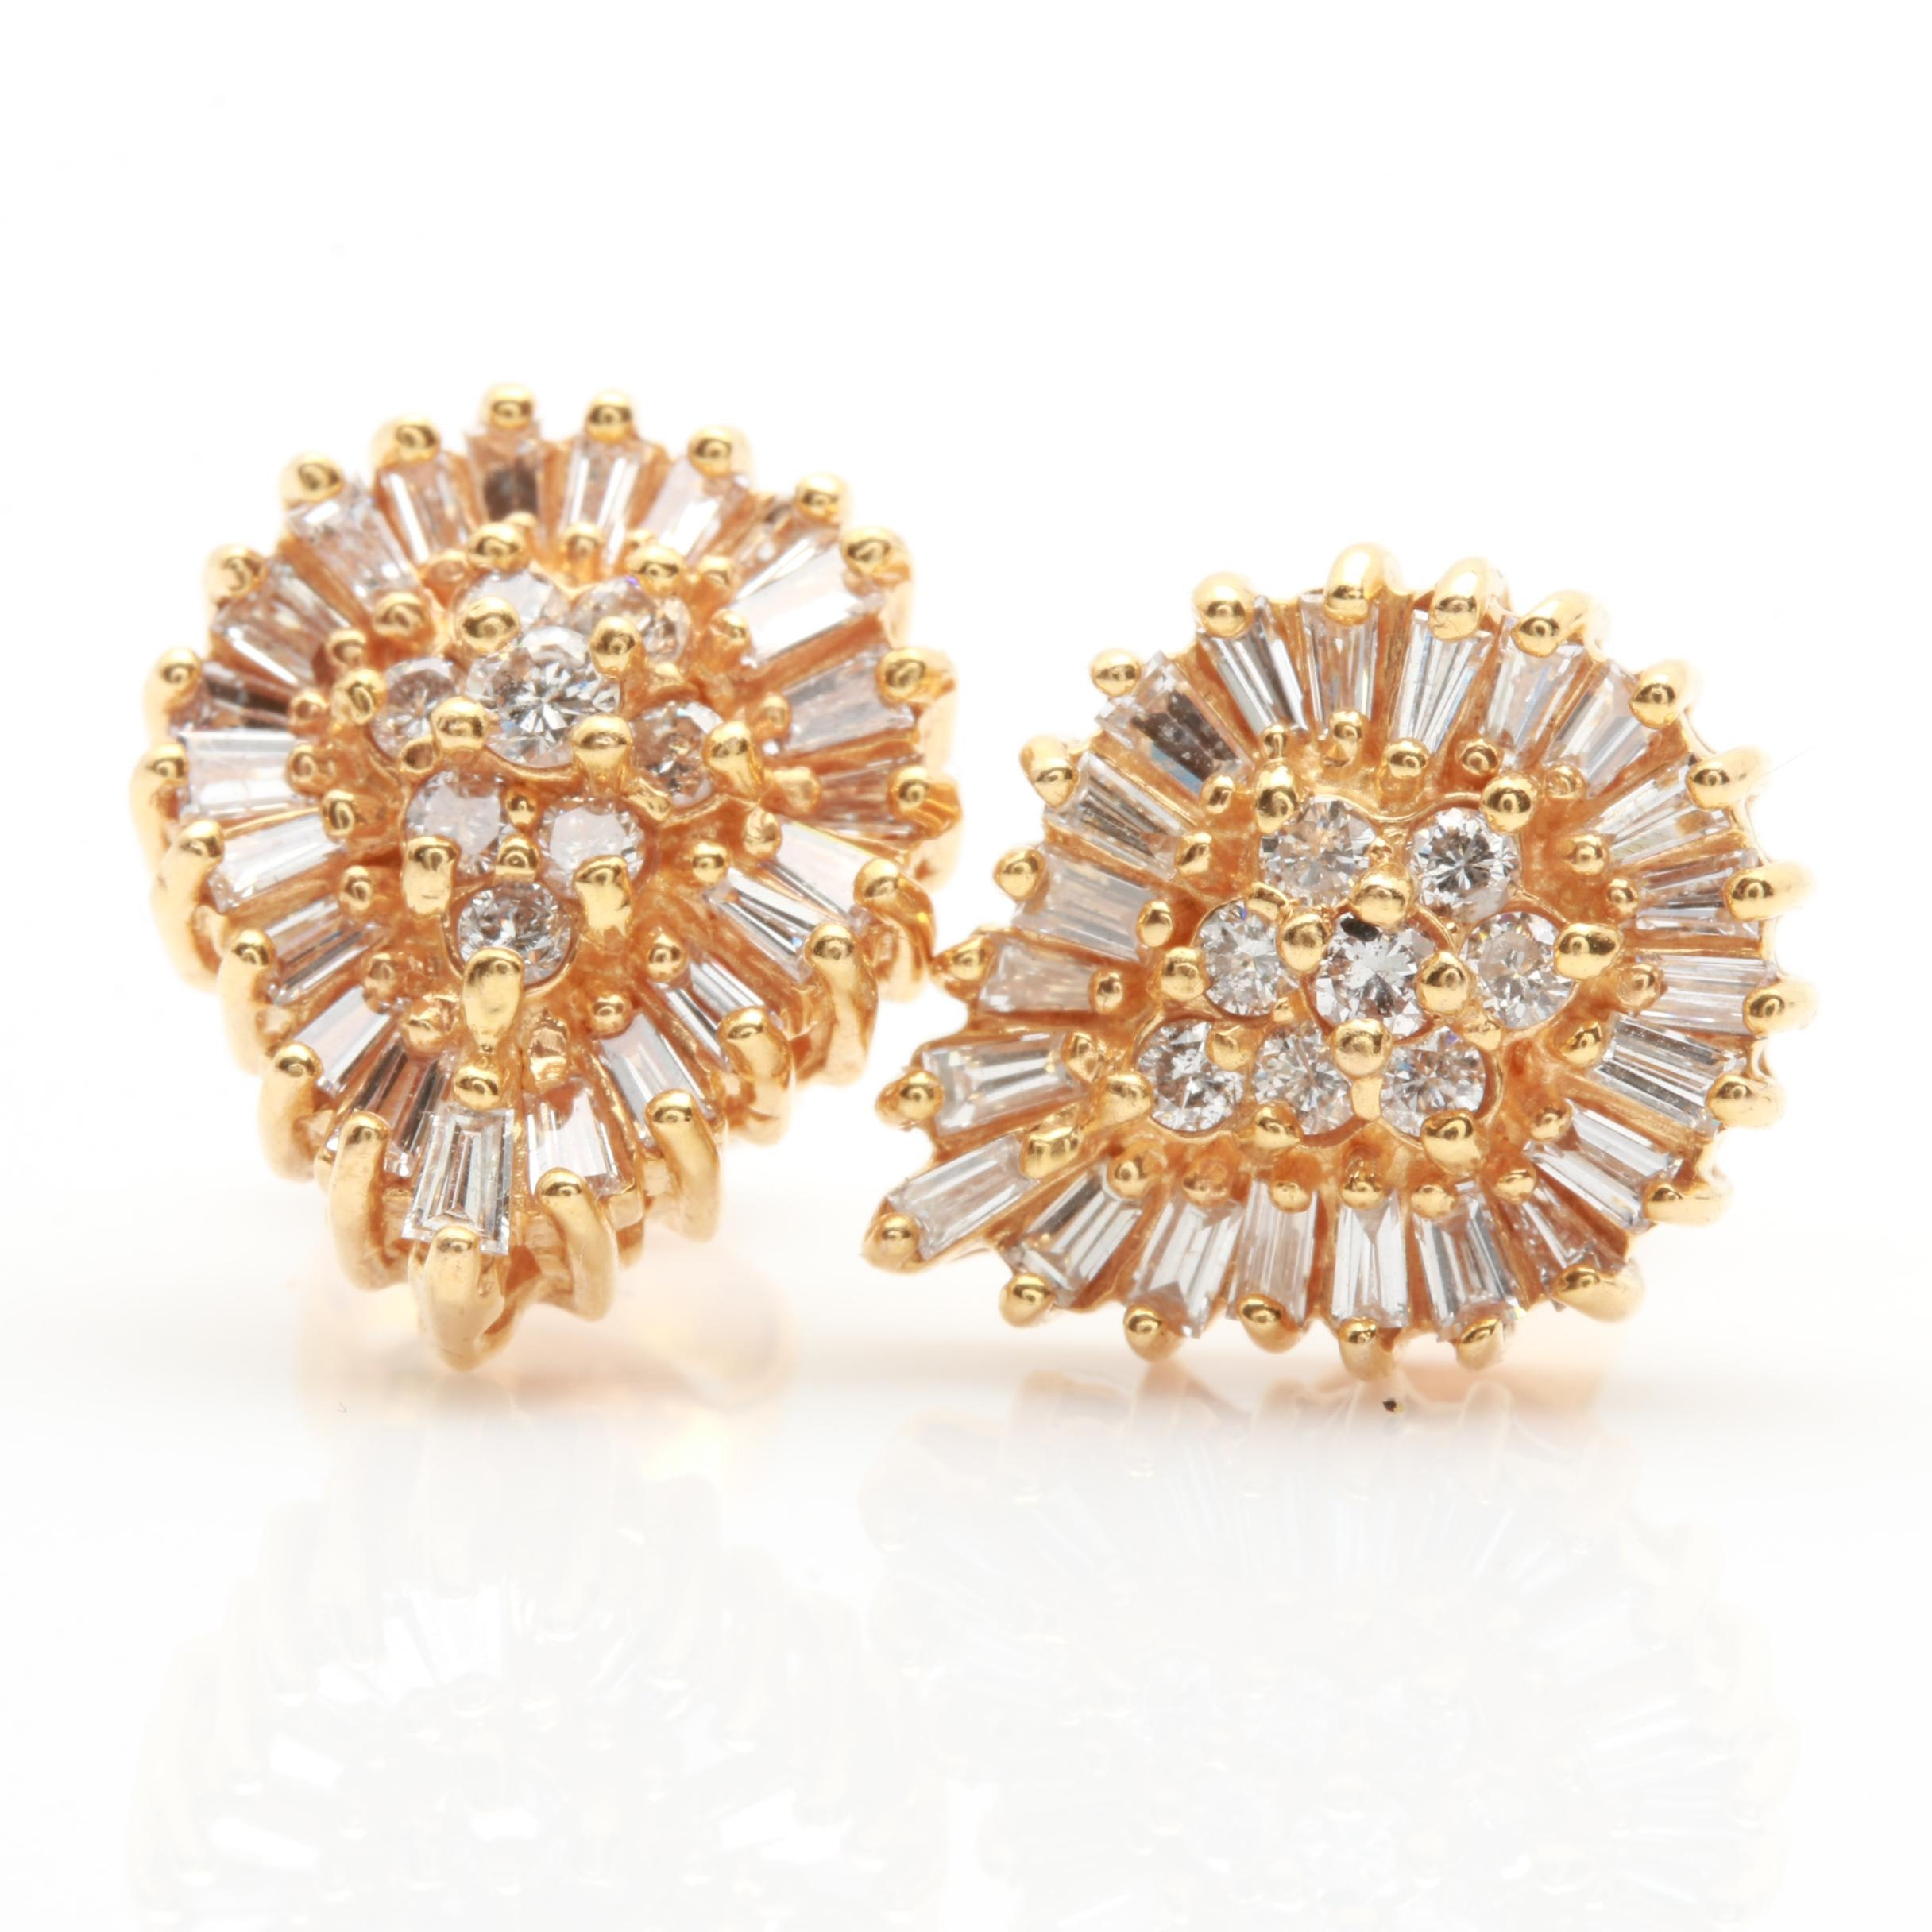 14K and 18K Yellow Gold 1.18 CTW Diamond Earrings